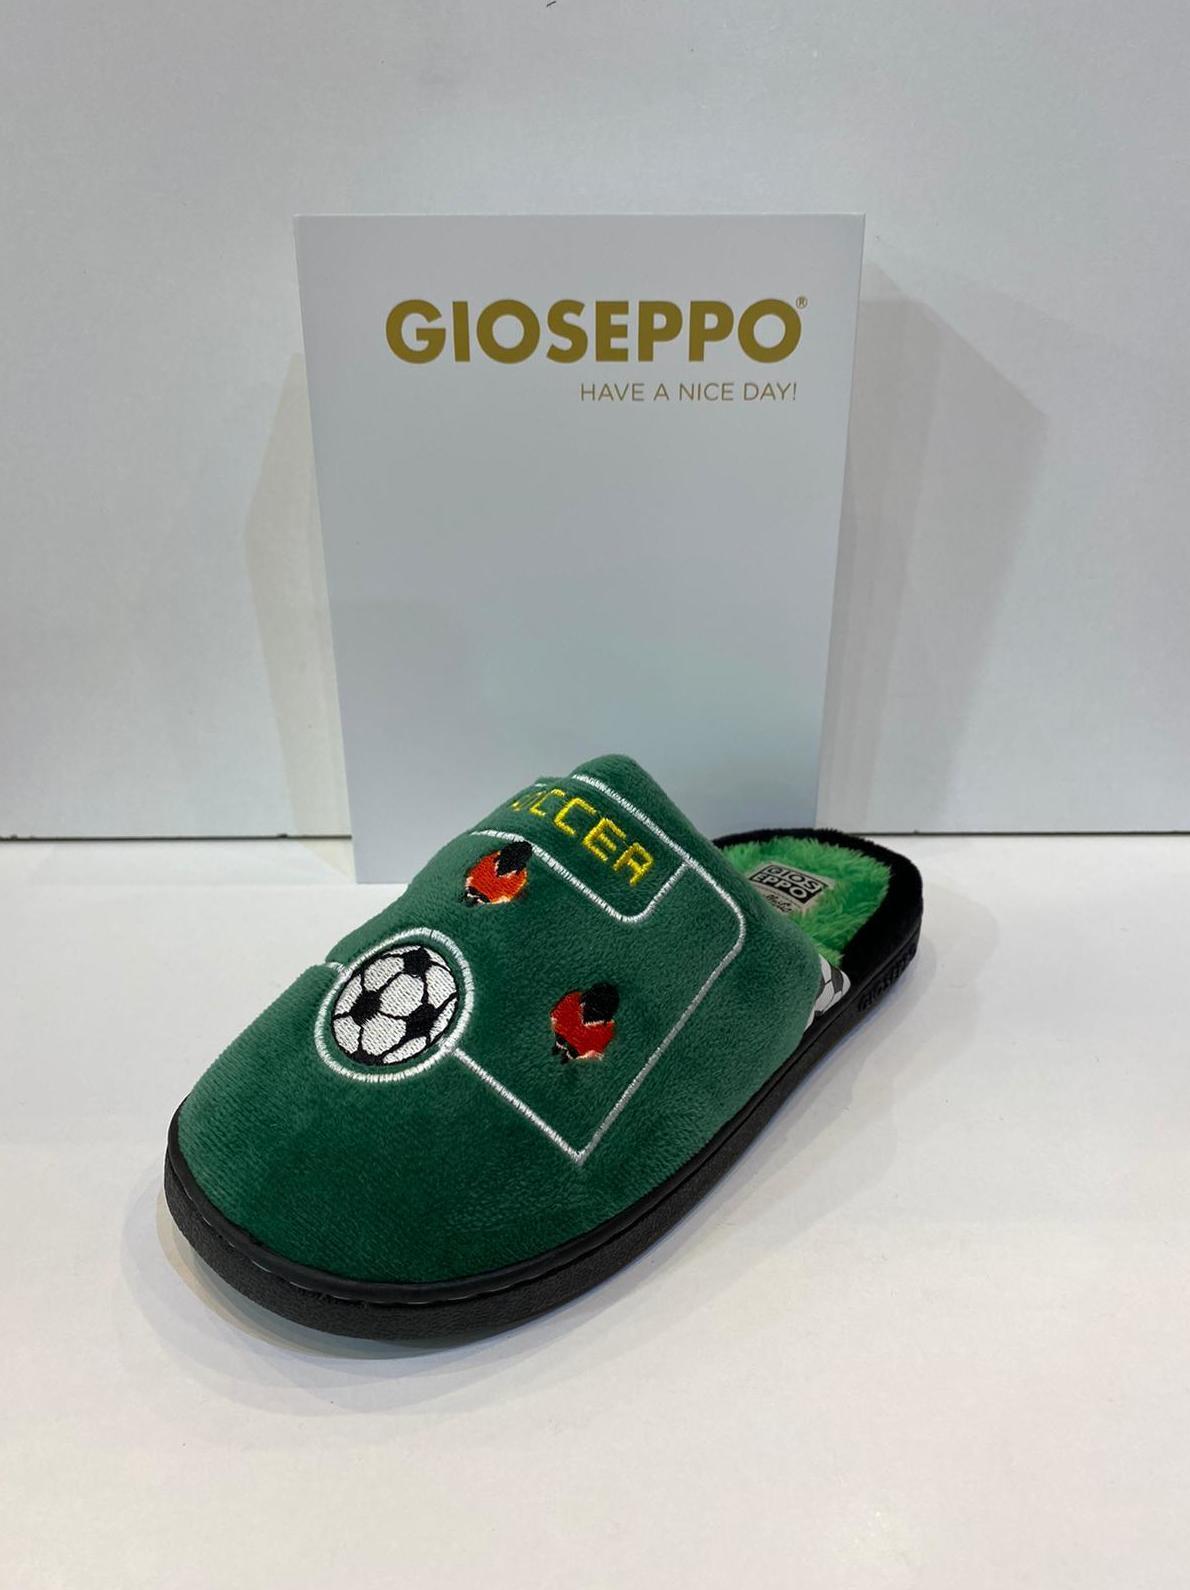 Espardenya de nen, de la marca Gioseppo, plantilla encoixinada i sola de goma 16.95€